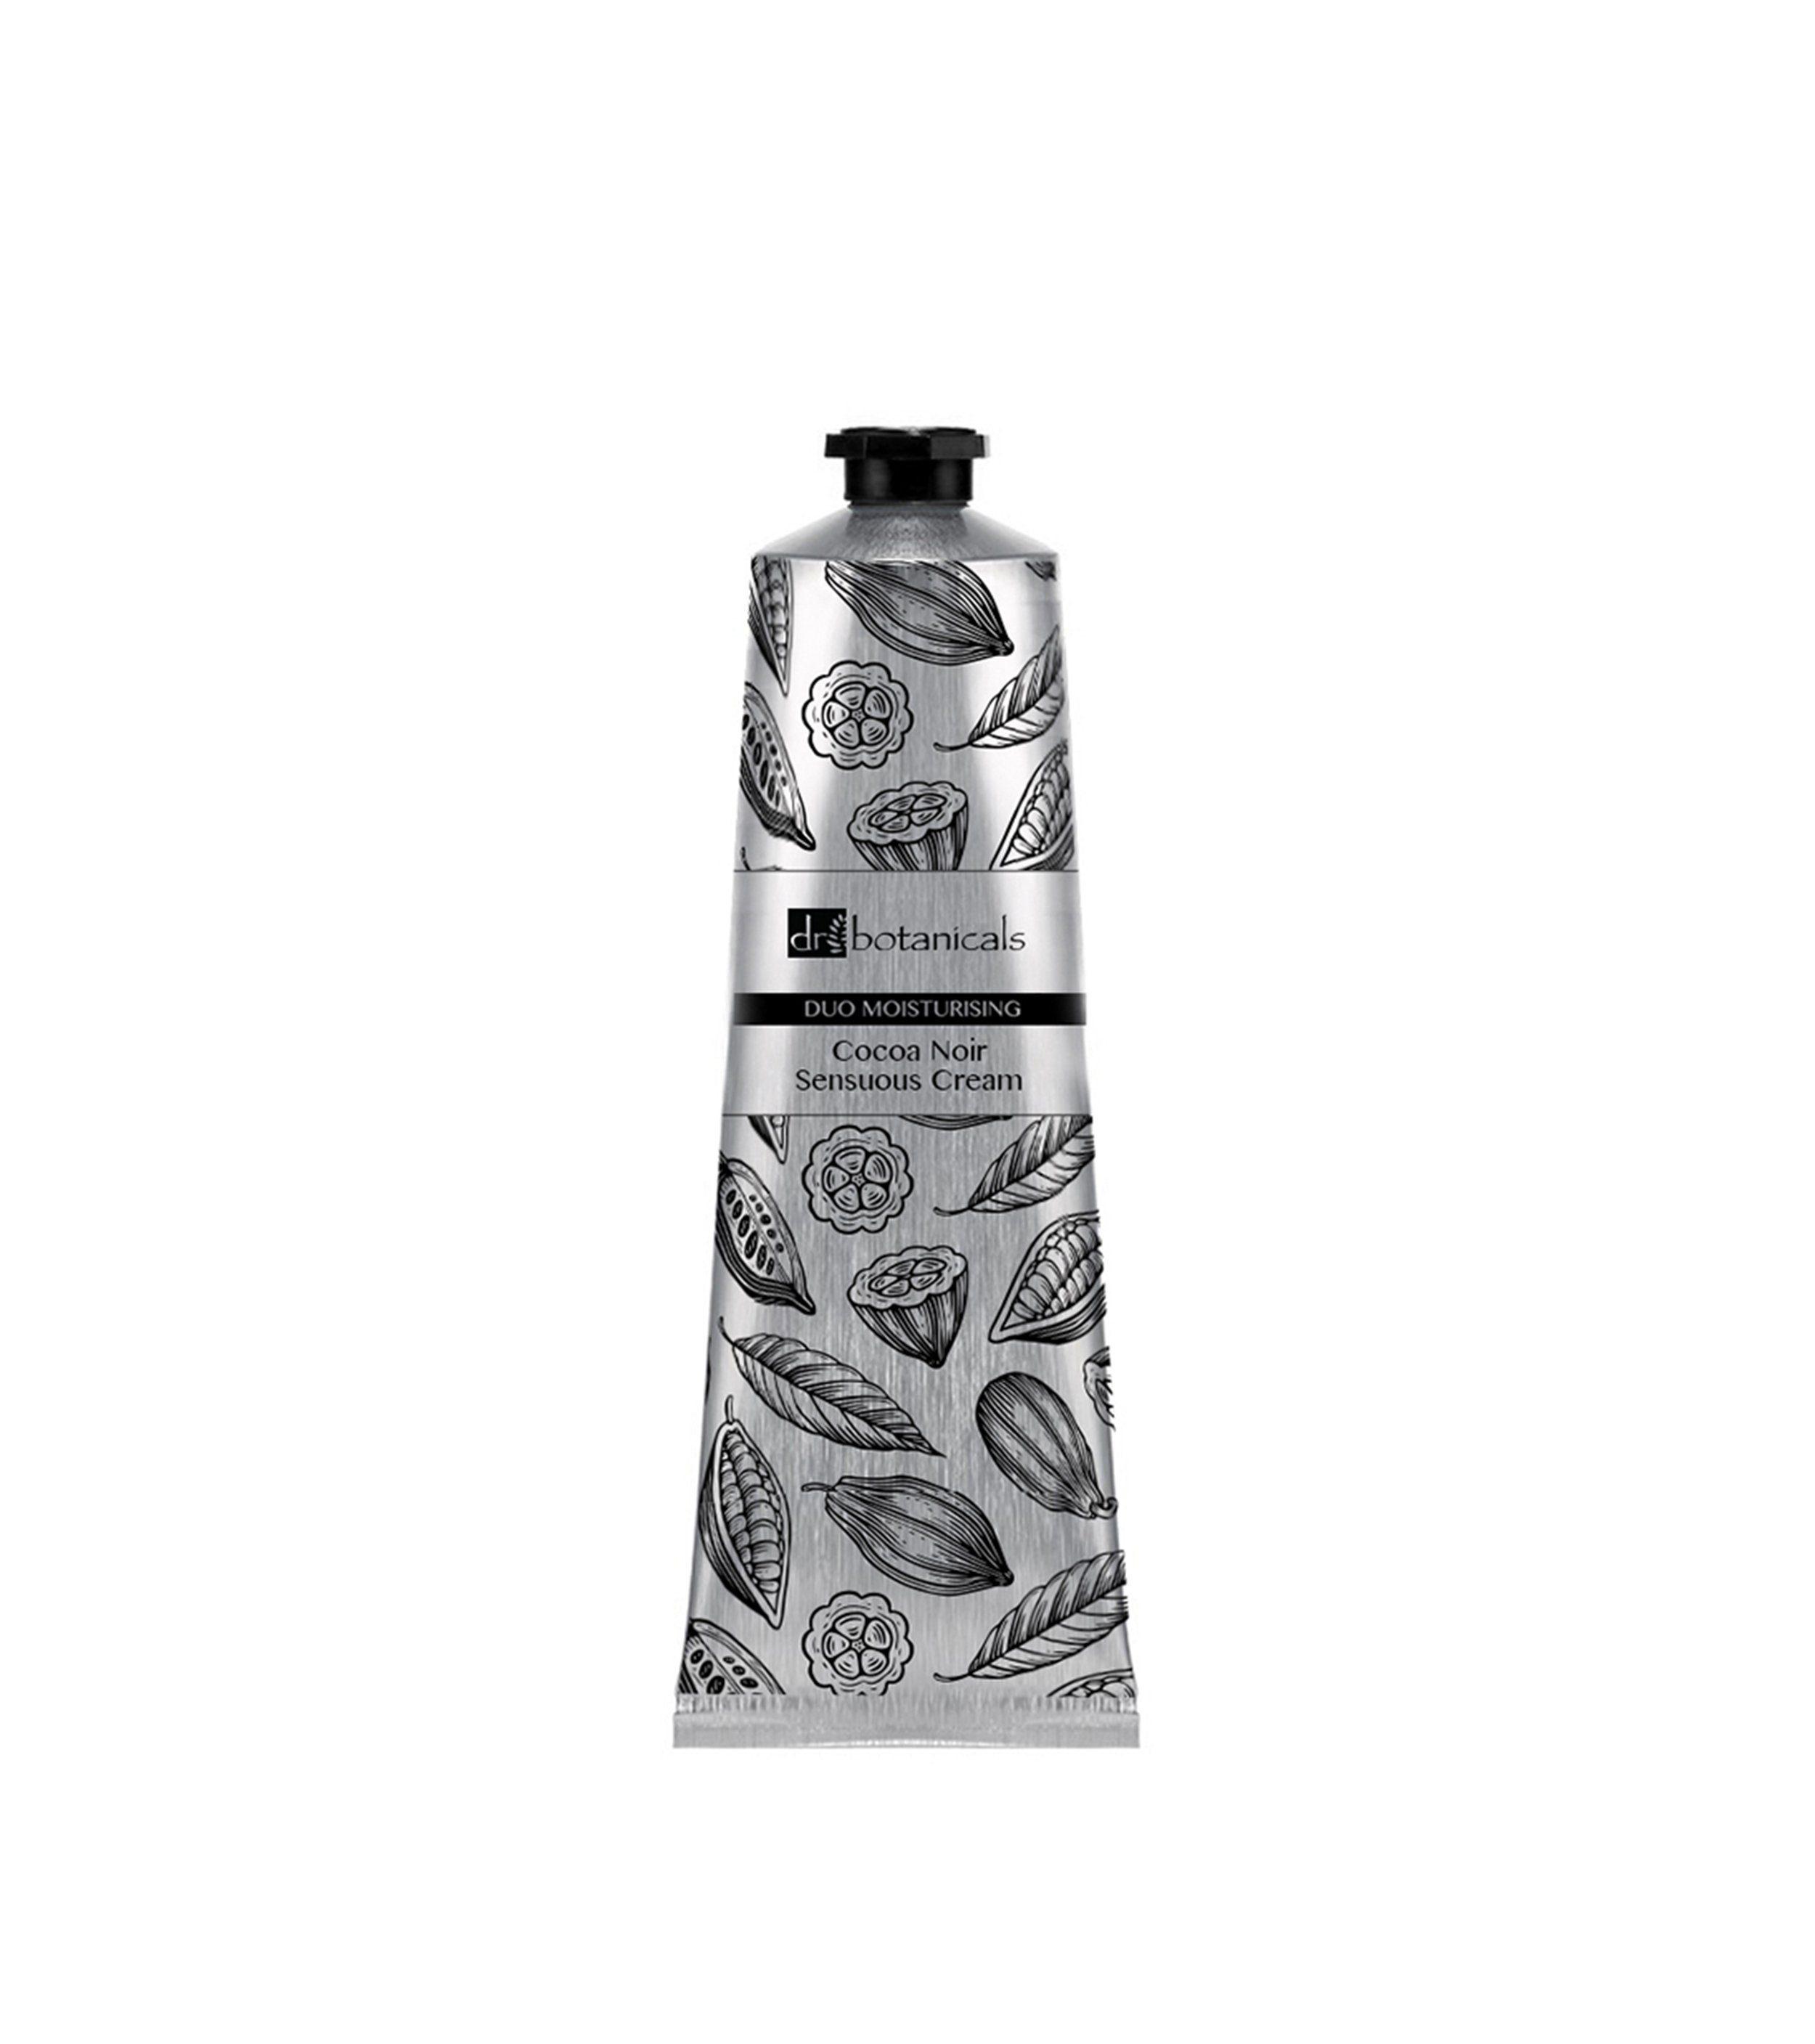 Dr Botanicals Feuchtigkeitscreme mit Kakao-Duft, 50 ml »Cocoa Noir Sensuous Cream«